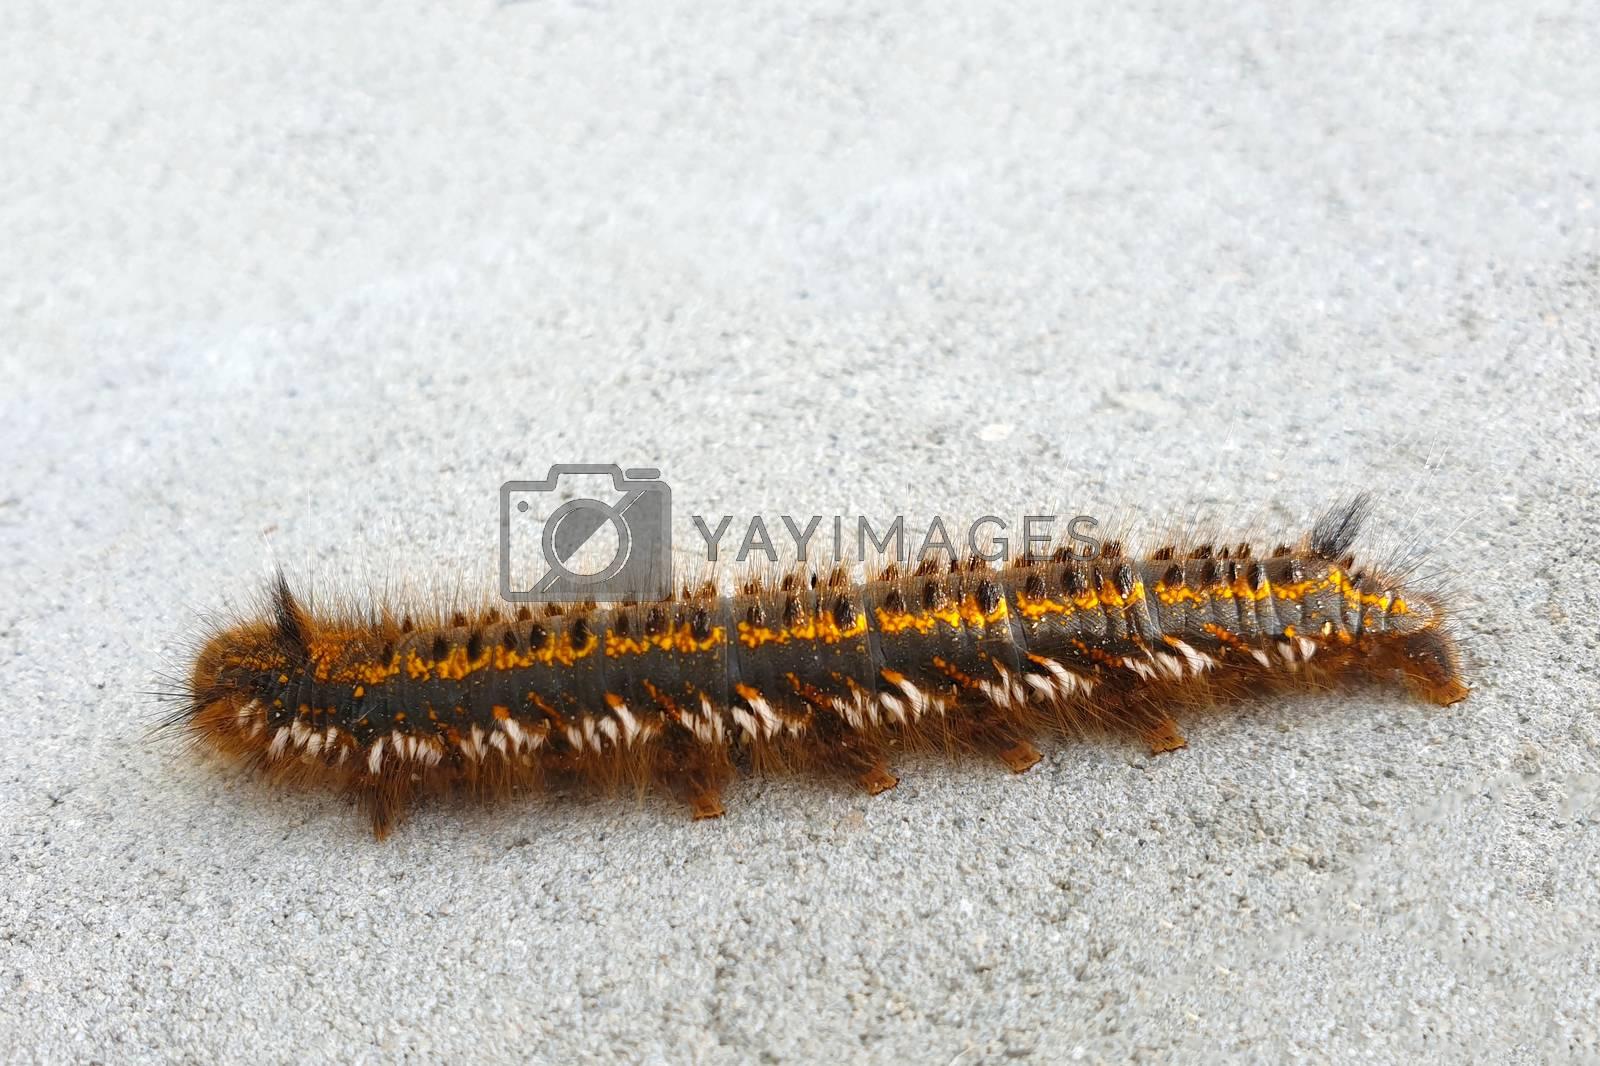 Hairy black caterpillar. Caterpillar on white background